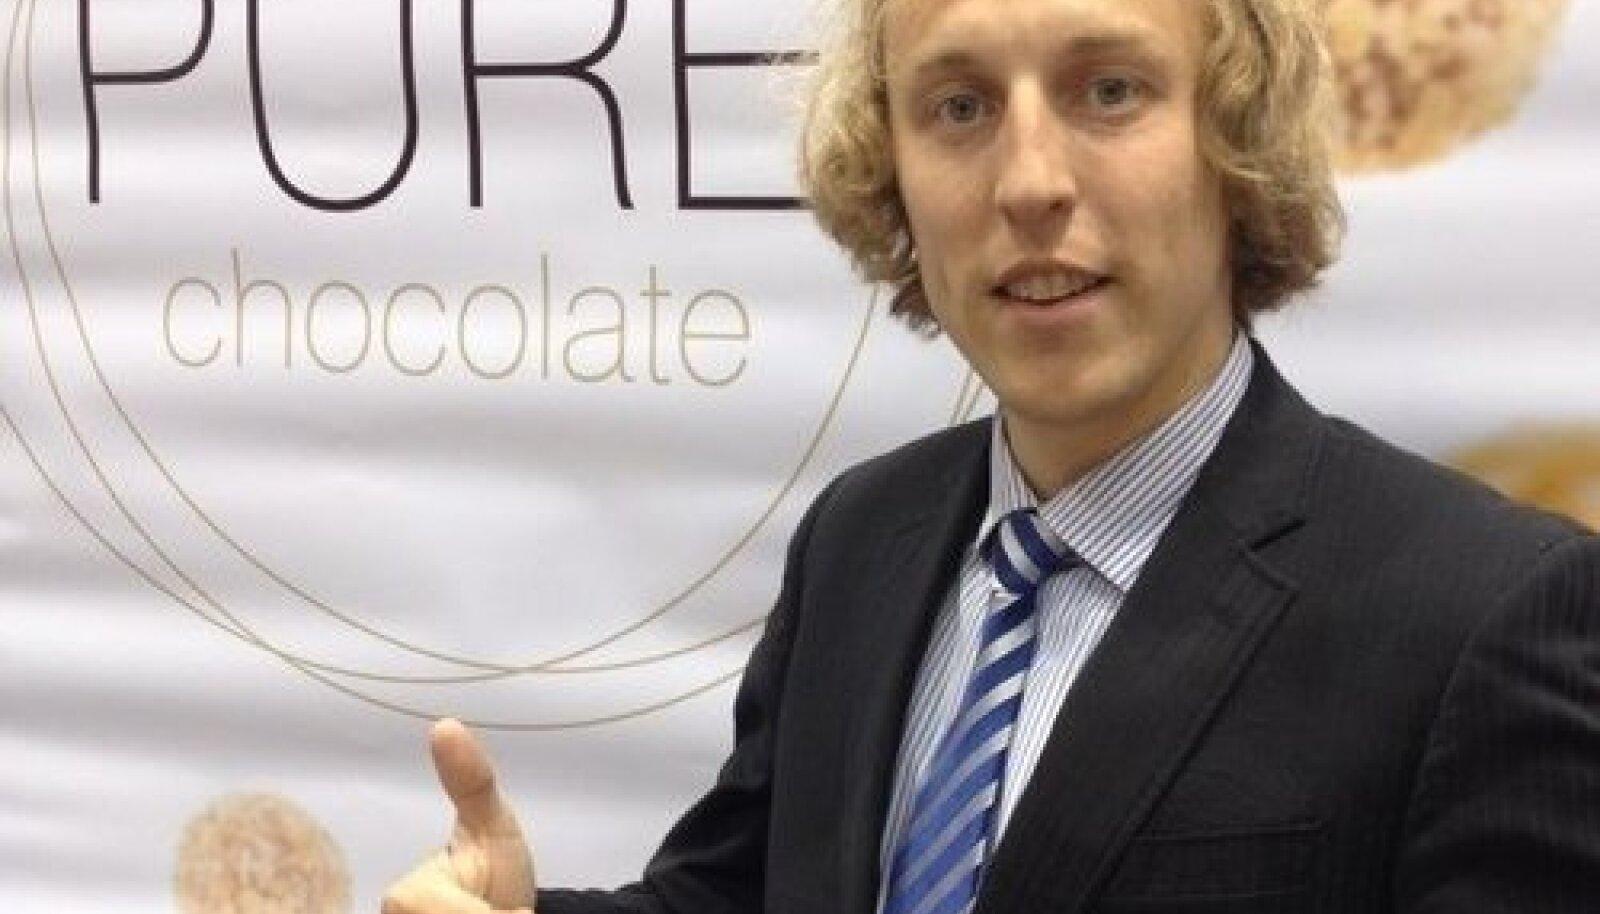 PURE Chocolate Factory juht Peteris Zimants.